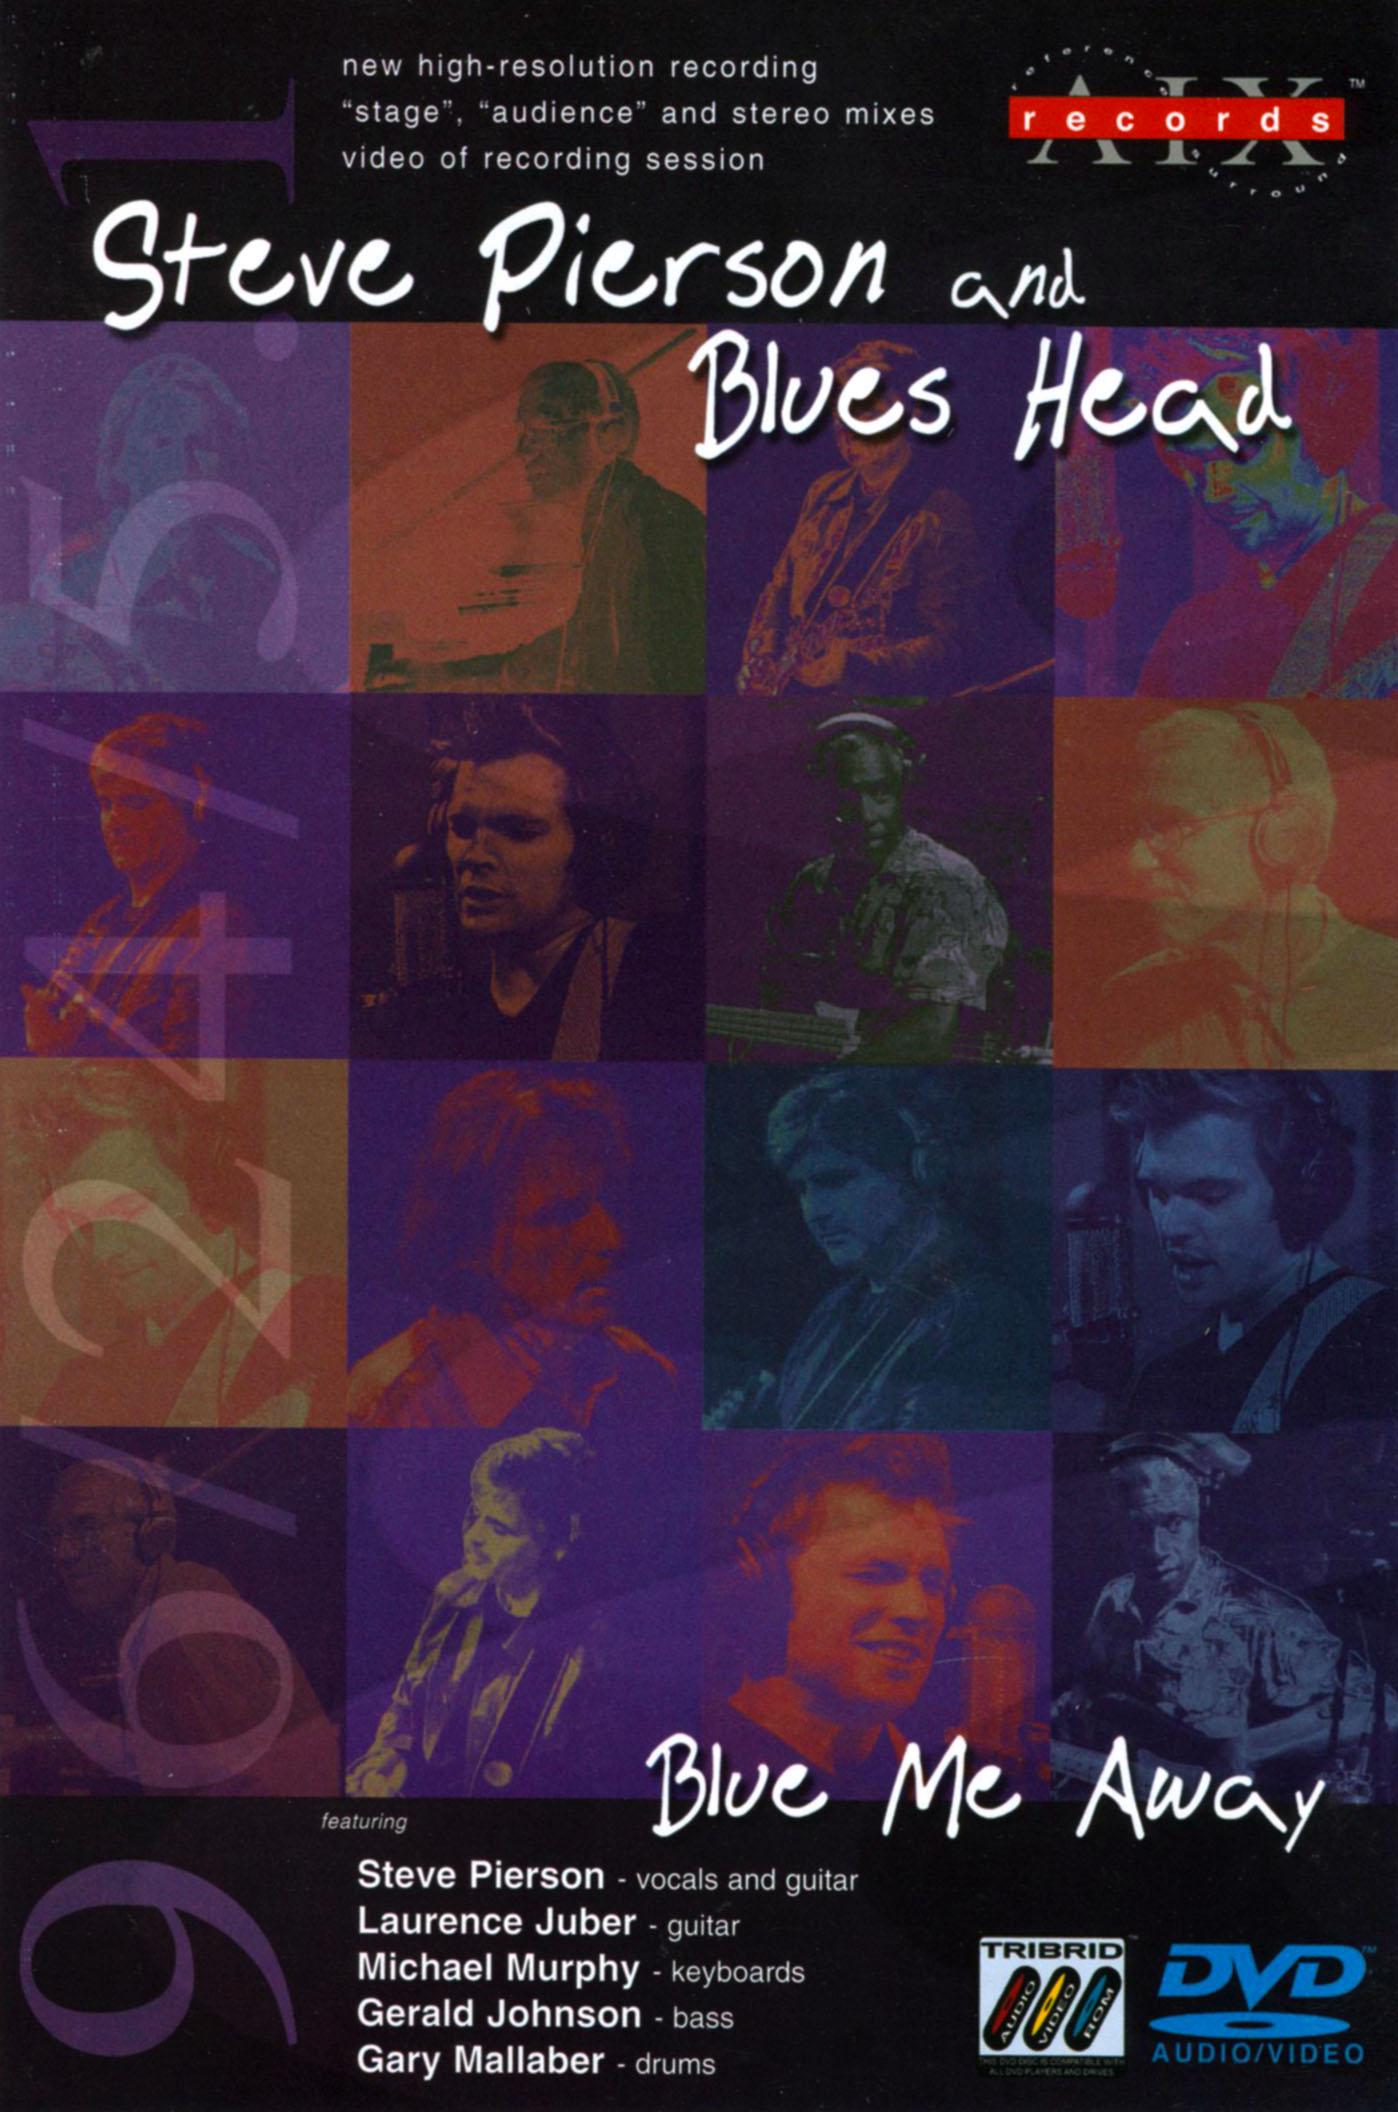 Steve Pierson and Blues Head: Blue Me Away